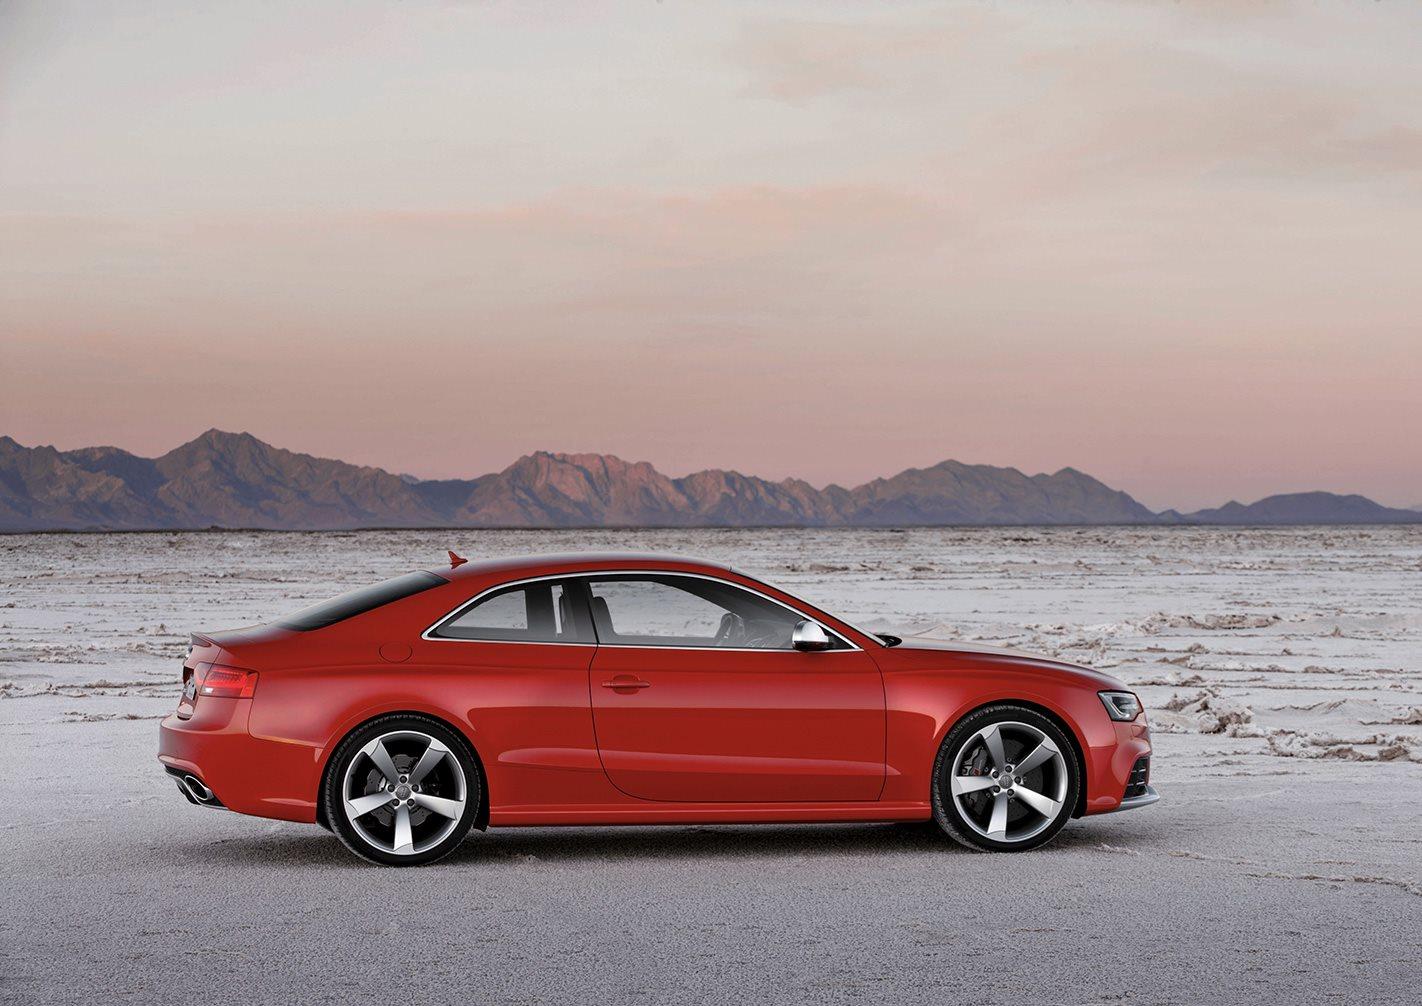 2010 Audi RS5 side profile